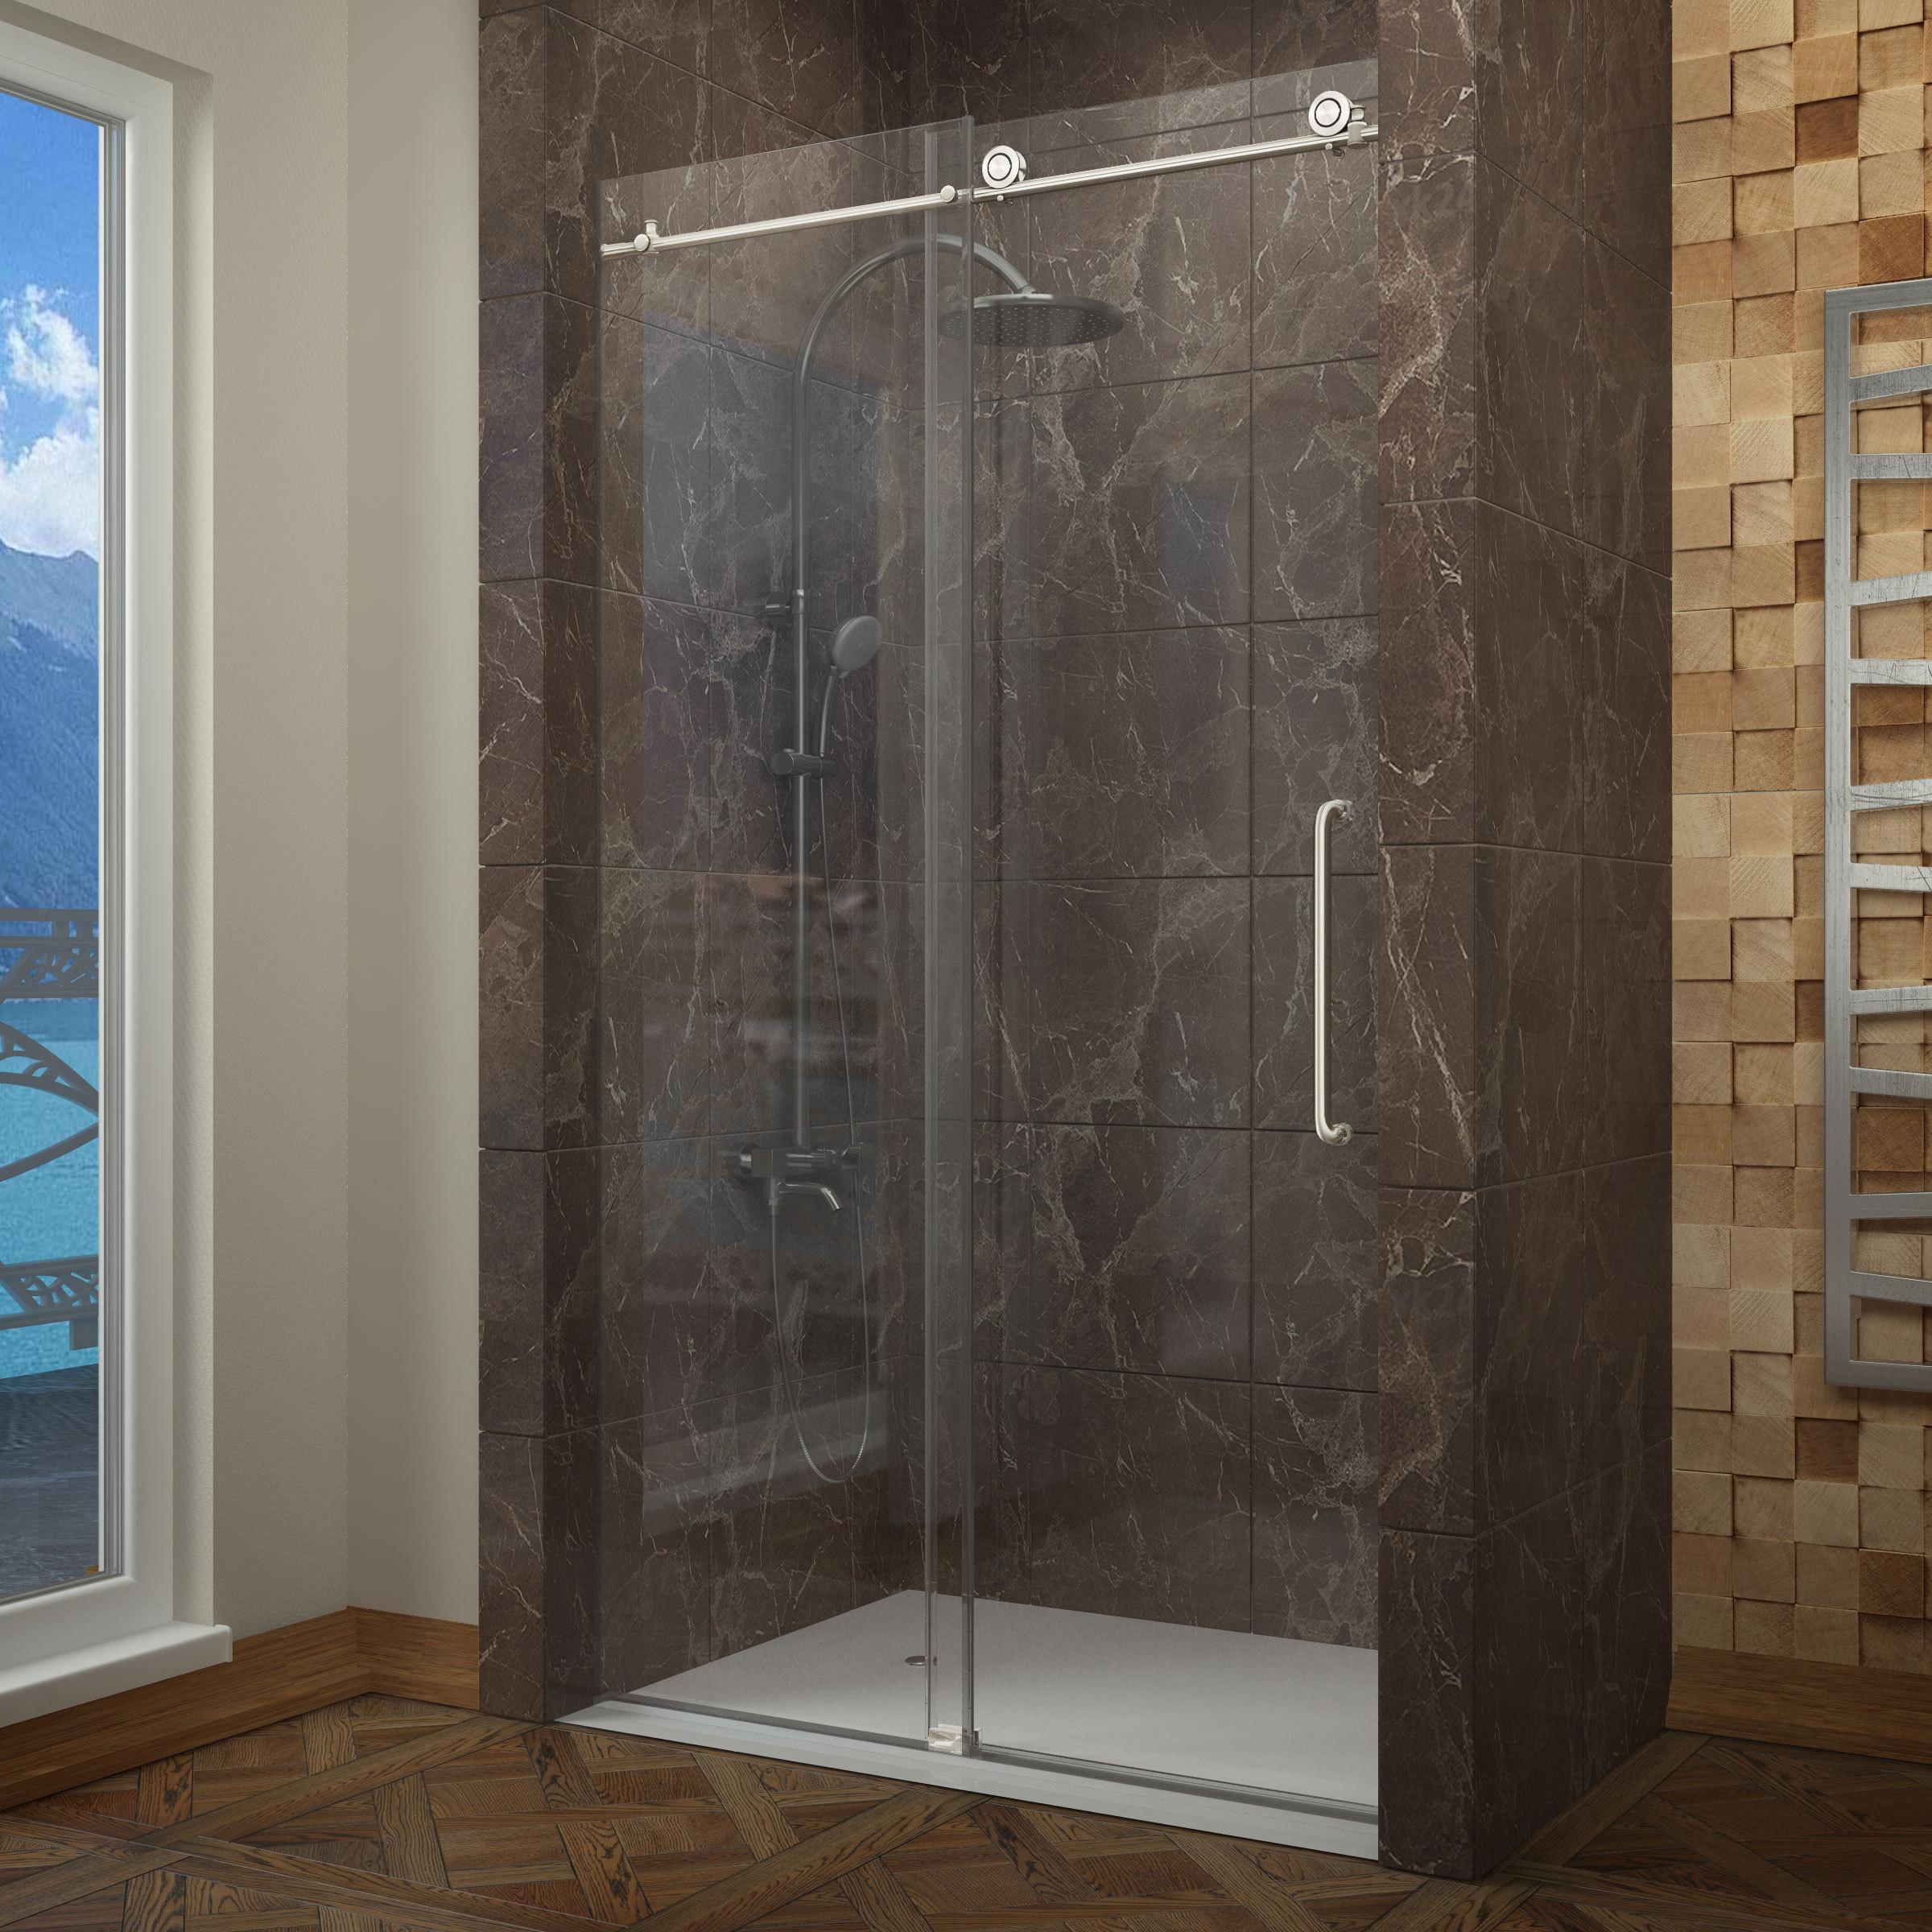 Anzzi Madam 60 X 76 Frameless Sliding Shower Door In Brushed Nickel